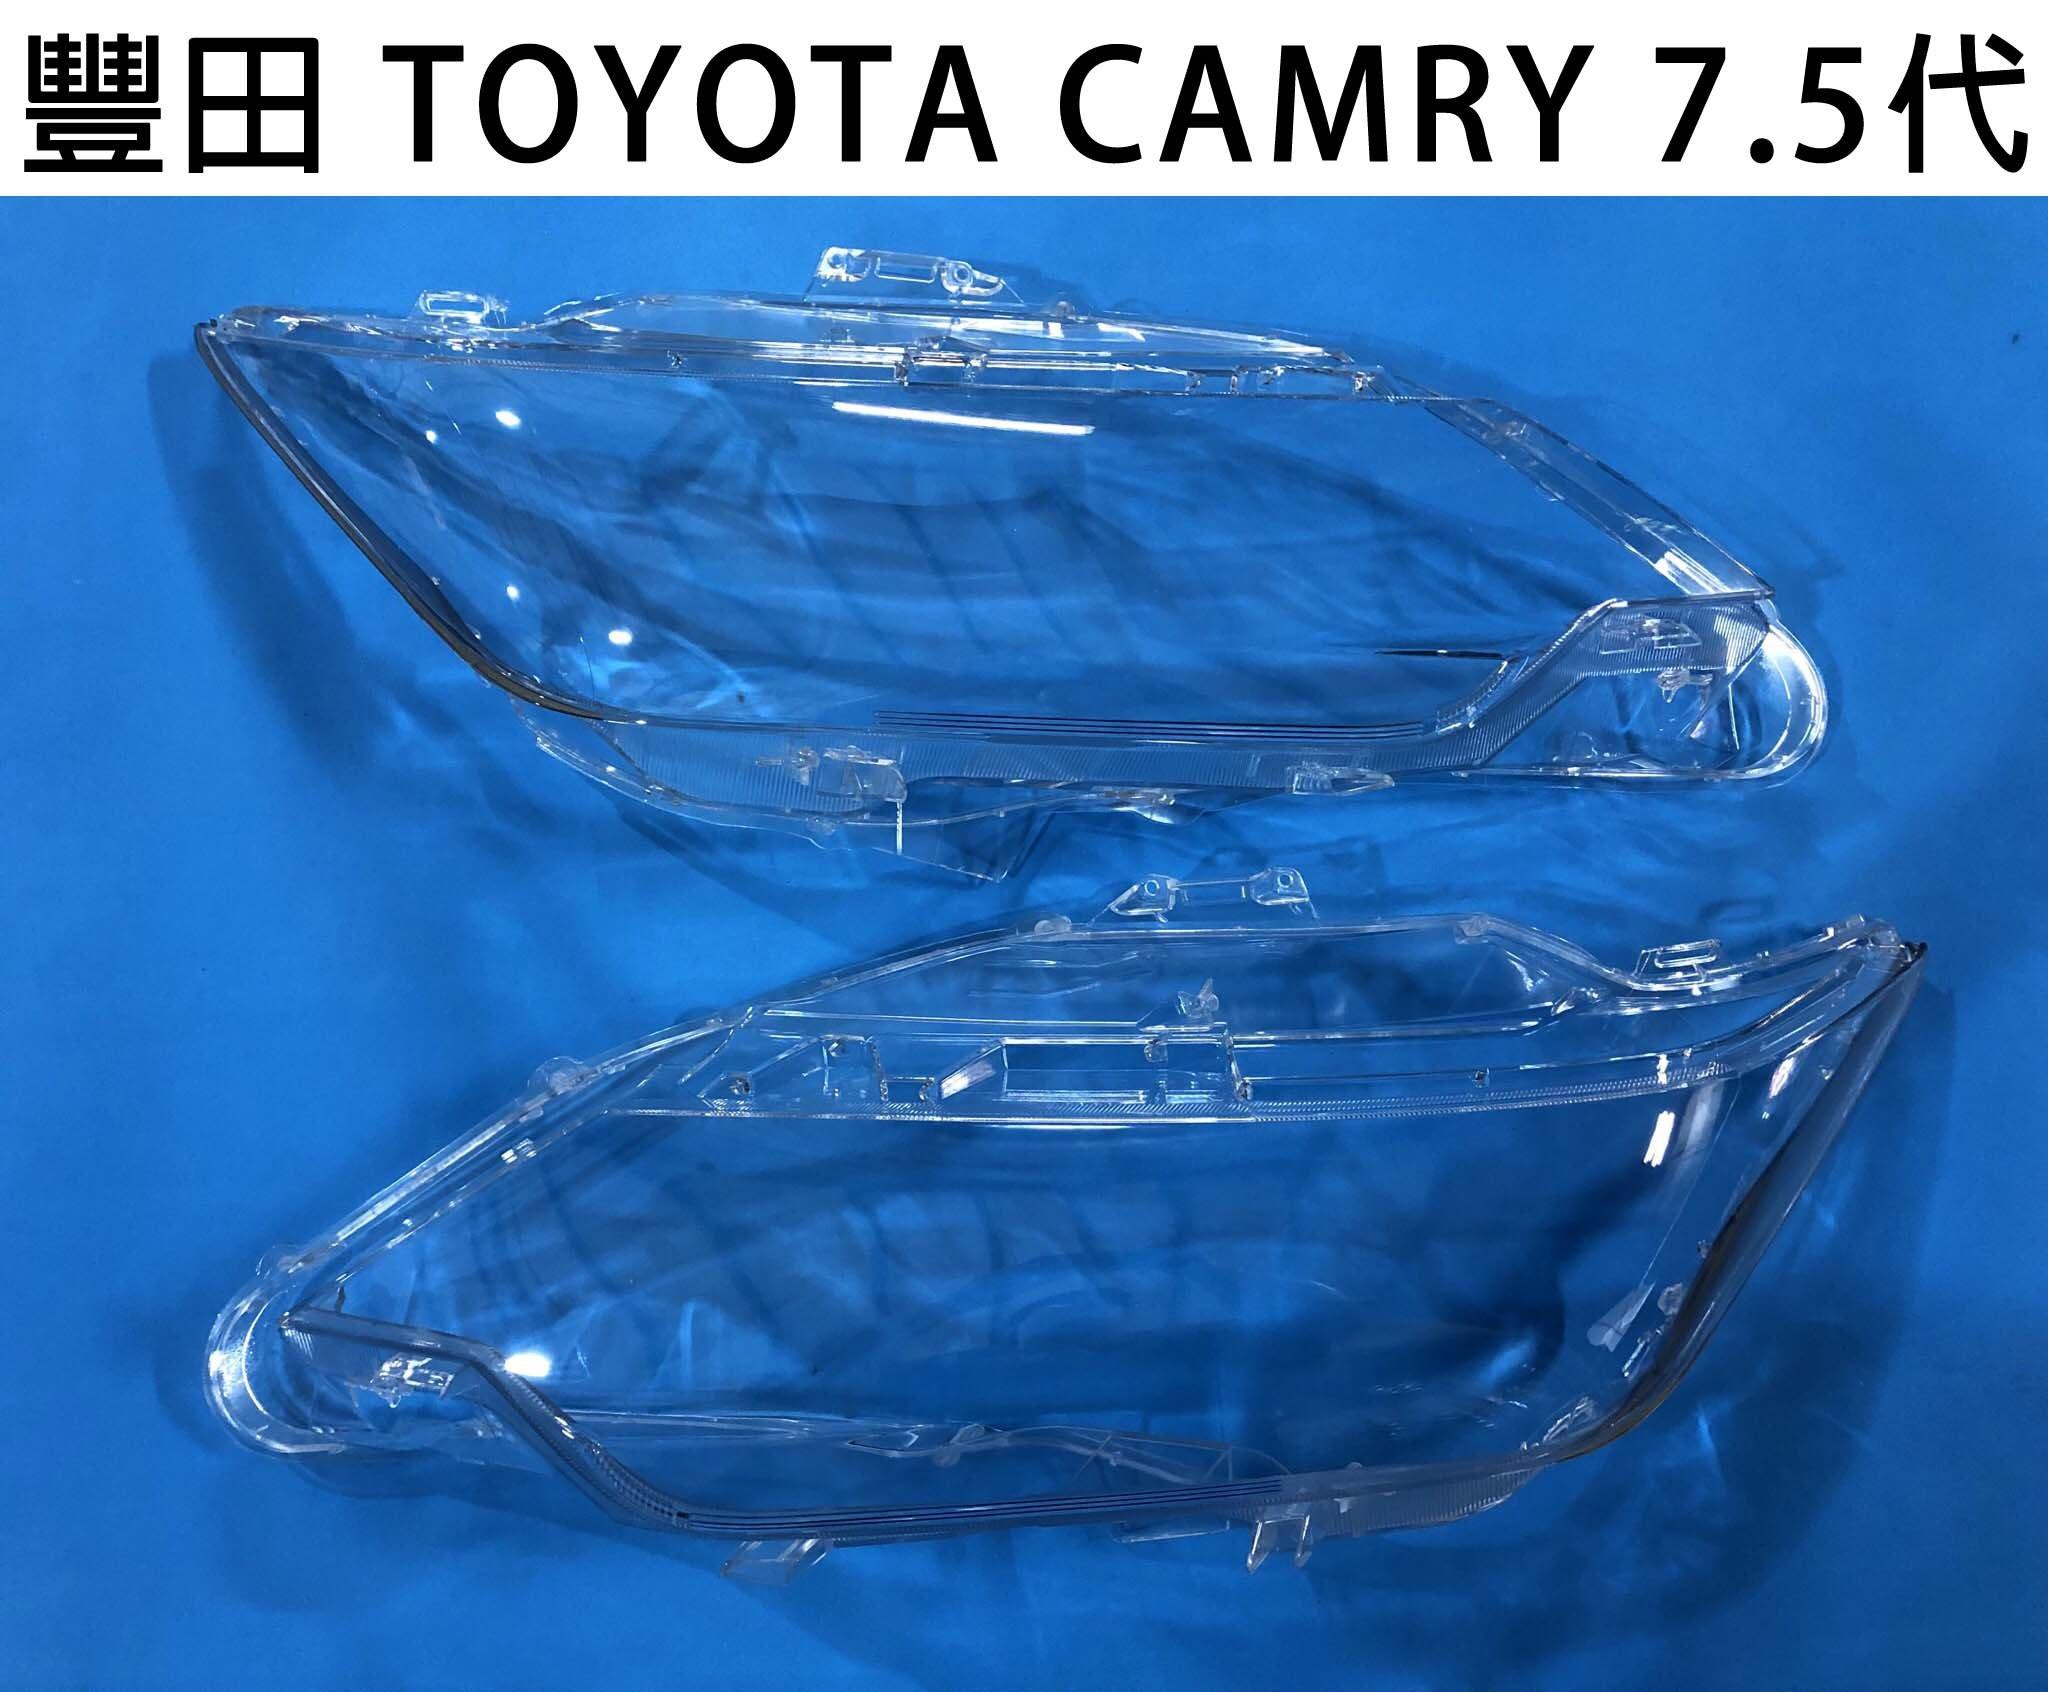 TOYOTA 豐田汽車專用大燈燈殼 燈罩豐田 TOYOTA CAMRY 7.5代 15-17年 適用 車款皆可詢問